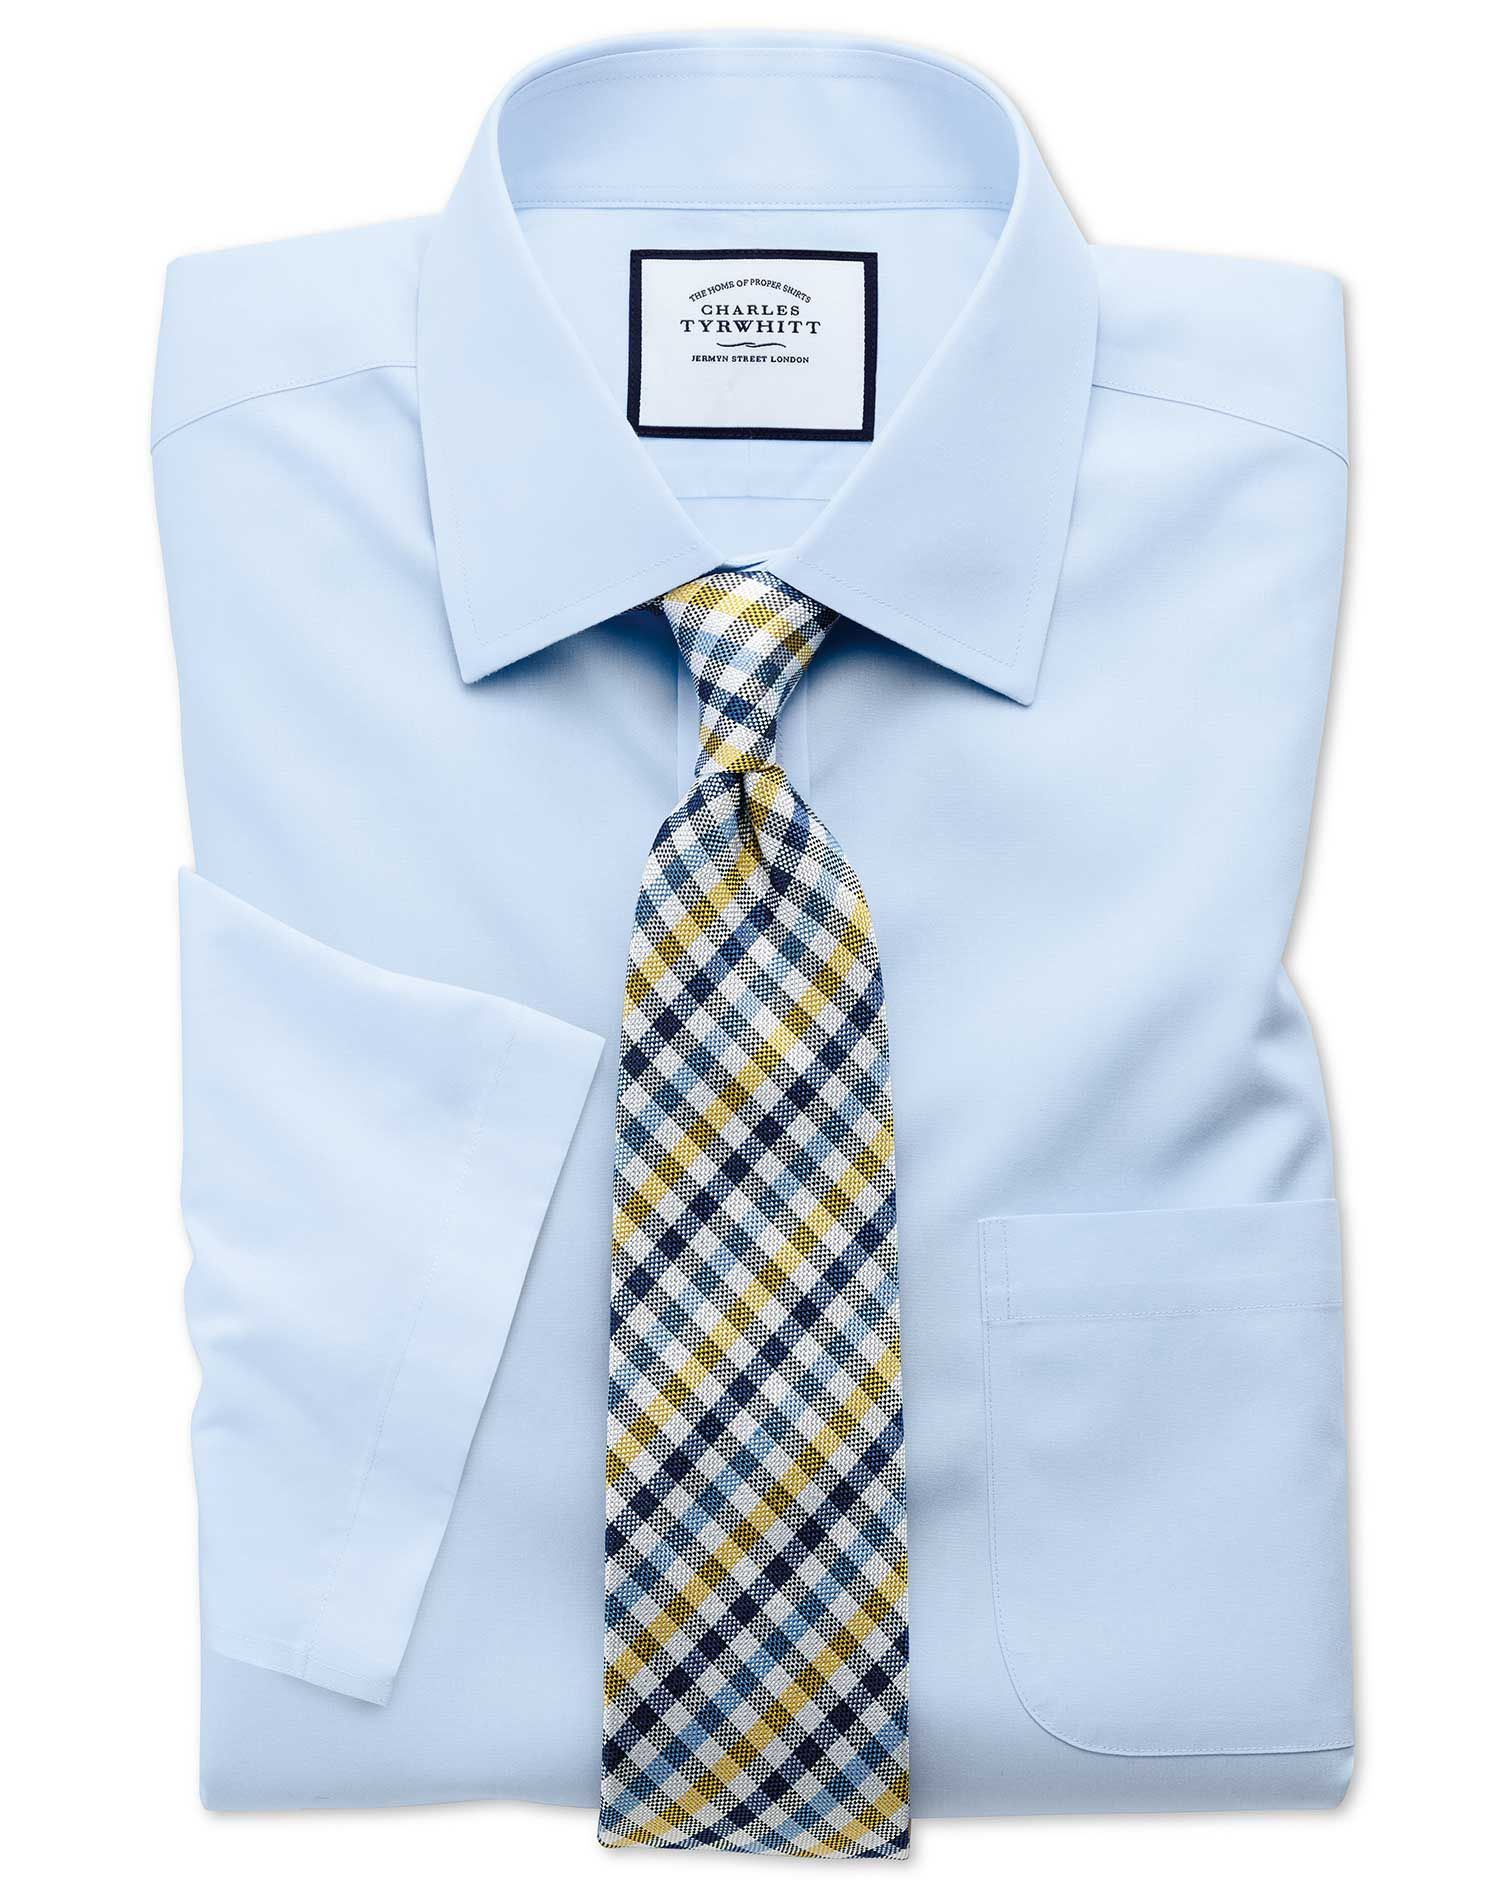 Classic Fit Sky Blue Non-Iron Poplin Short Sleeve Cotton Dress Shirt Size 17.5/Short by Charles Tyrwhitt #shortsleevedressshirts